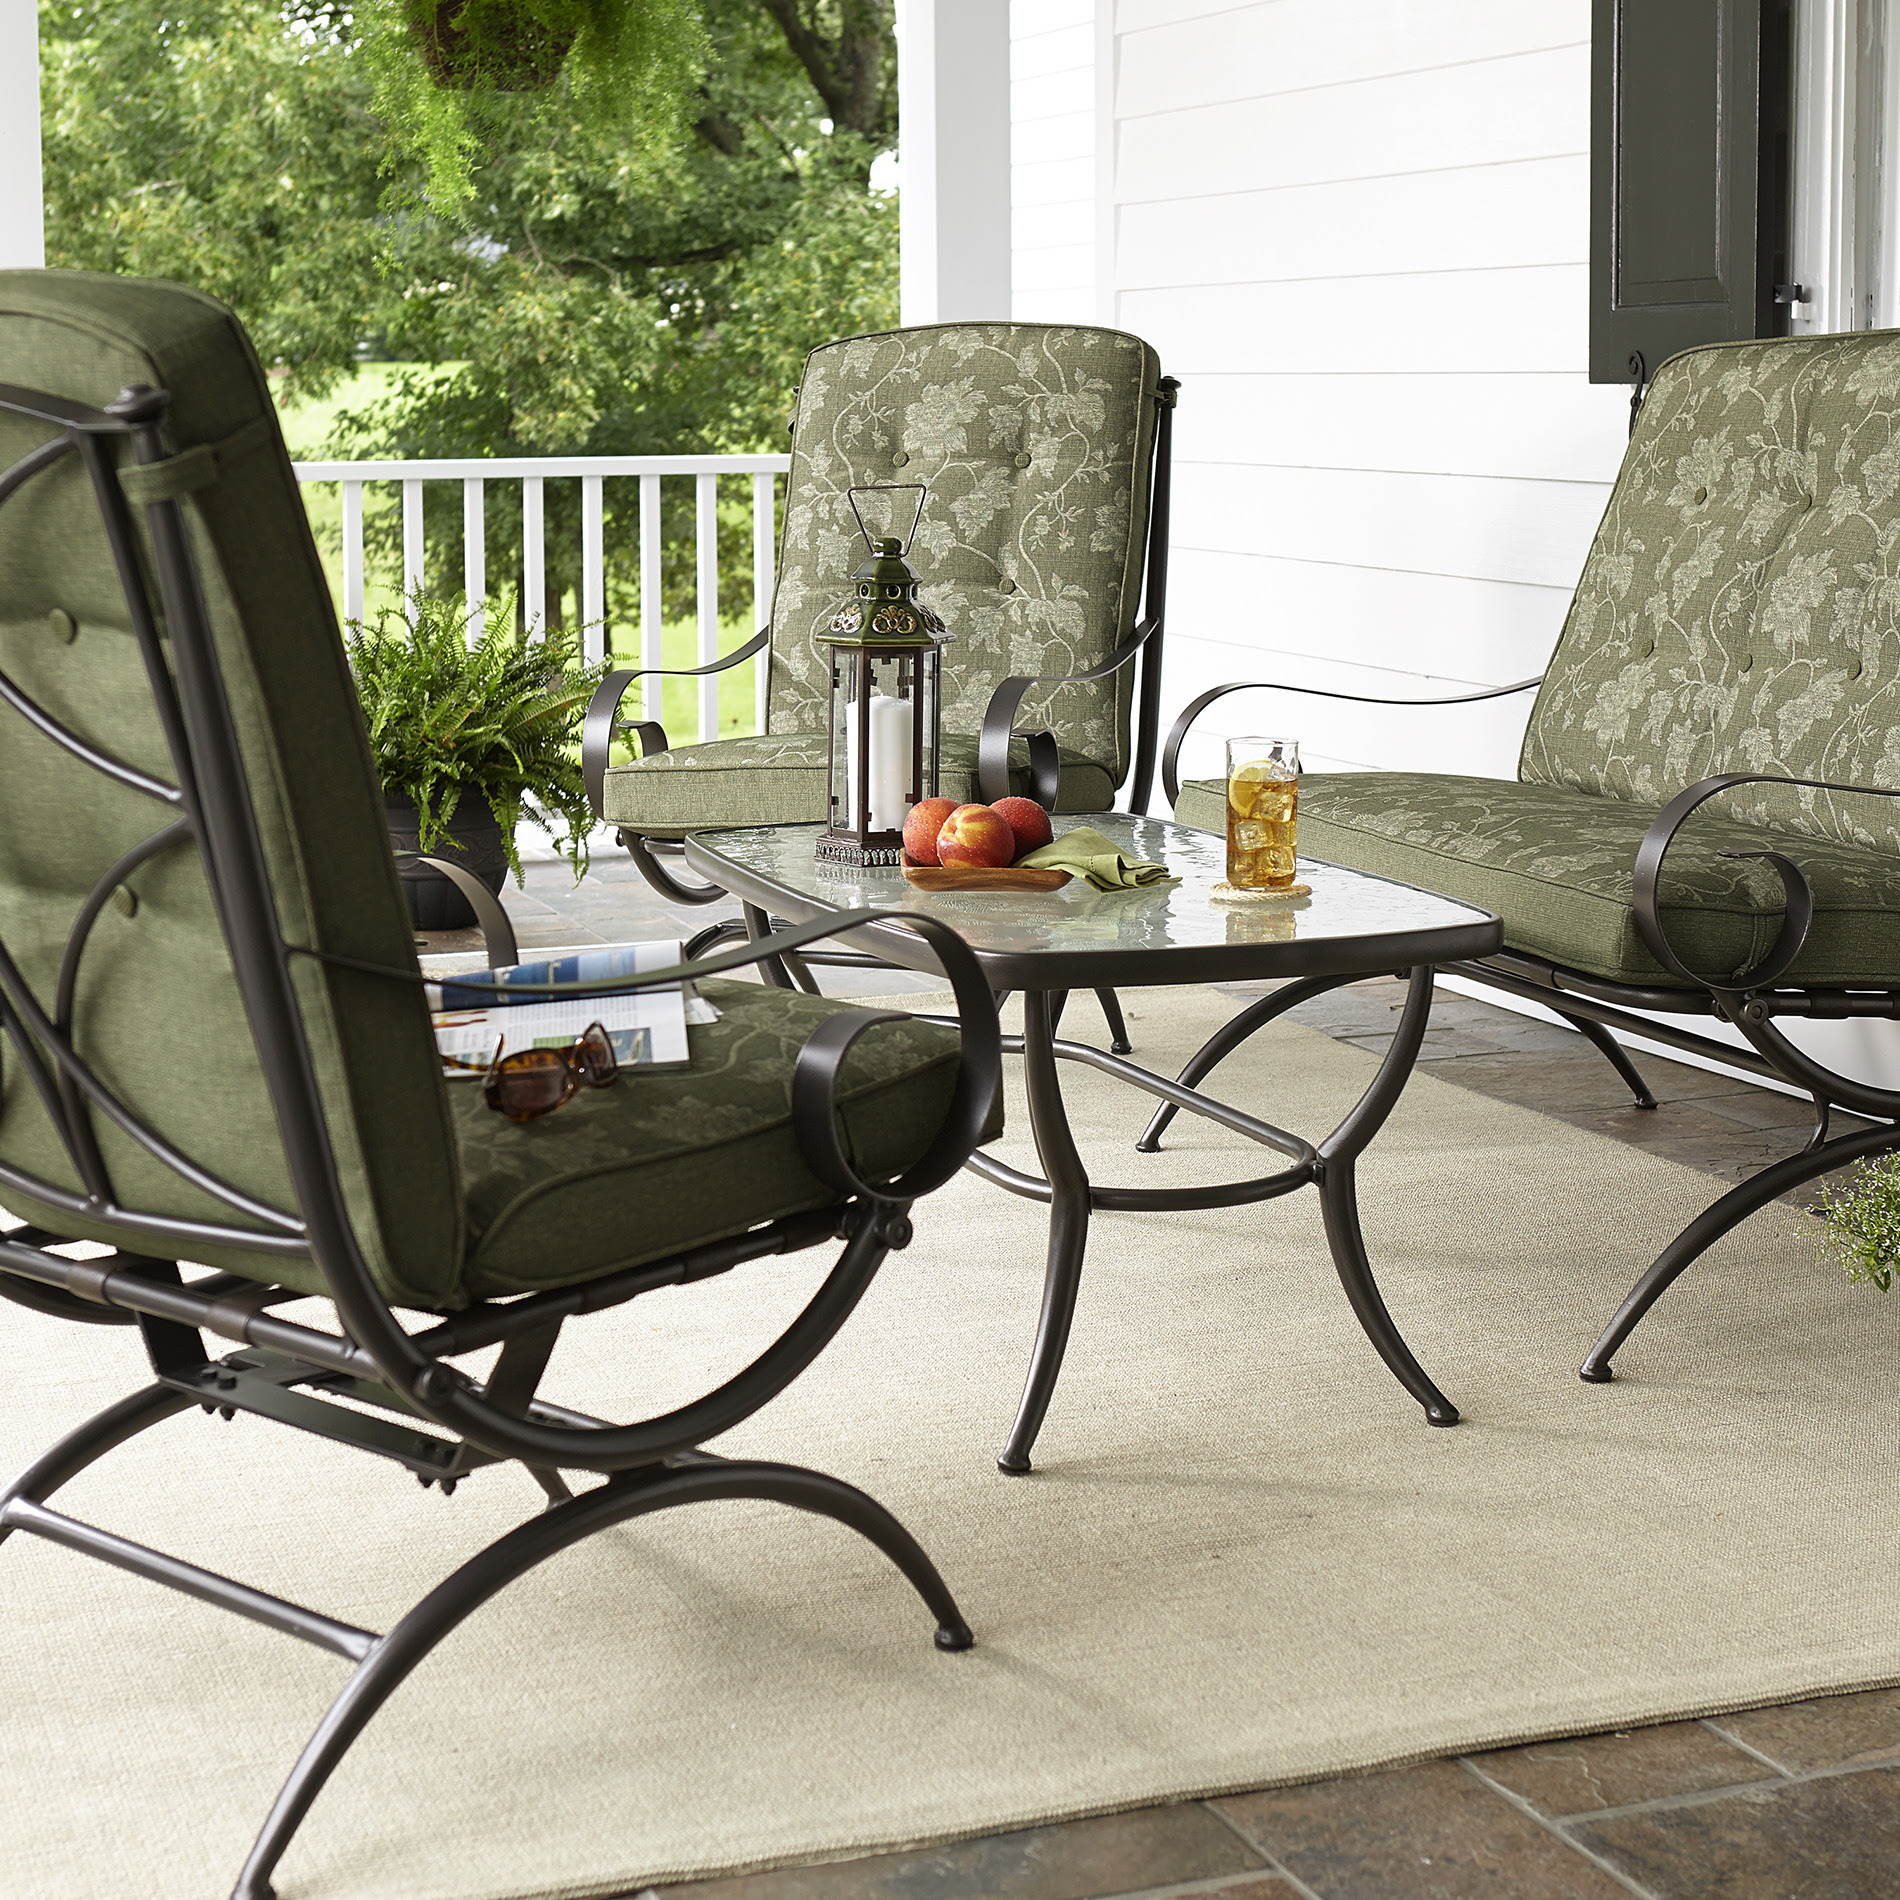 58 kmart patio furniture dining sets